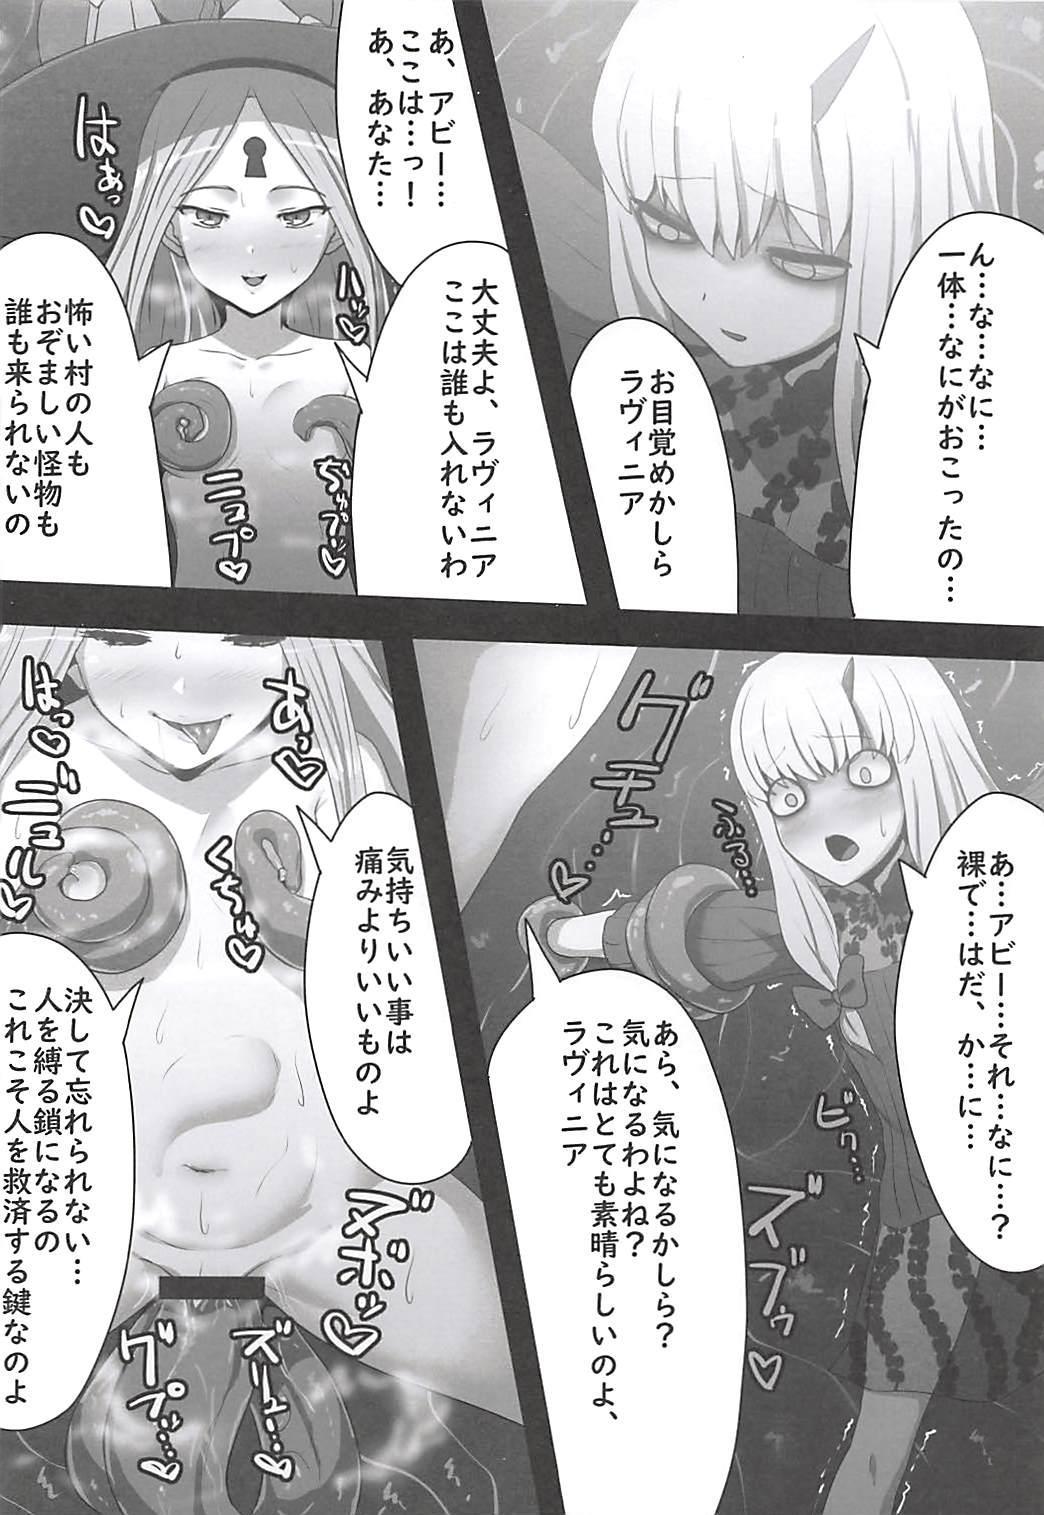 FGO Ashu Tokuiten Goudou - Ashu Reiyoku Danshou 49